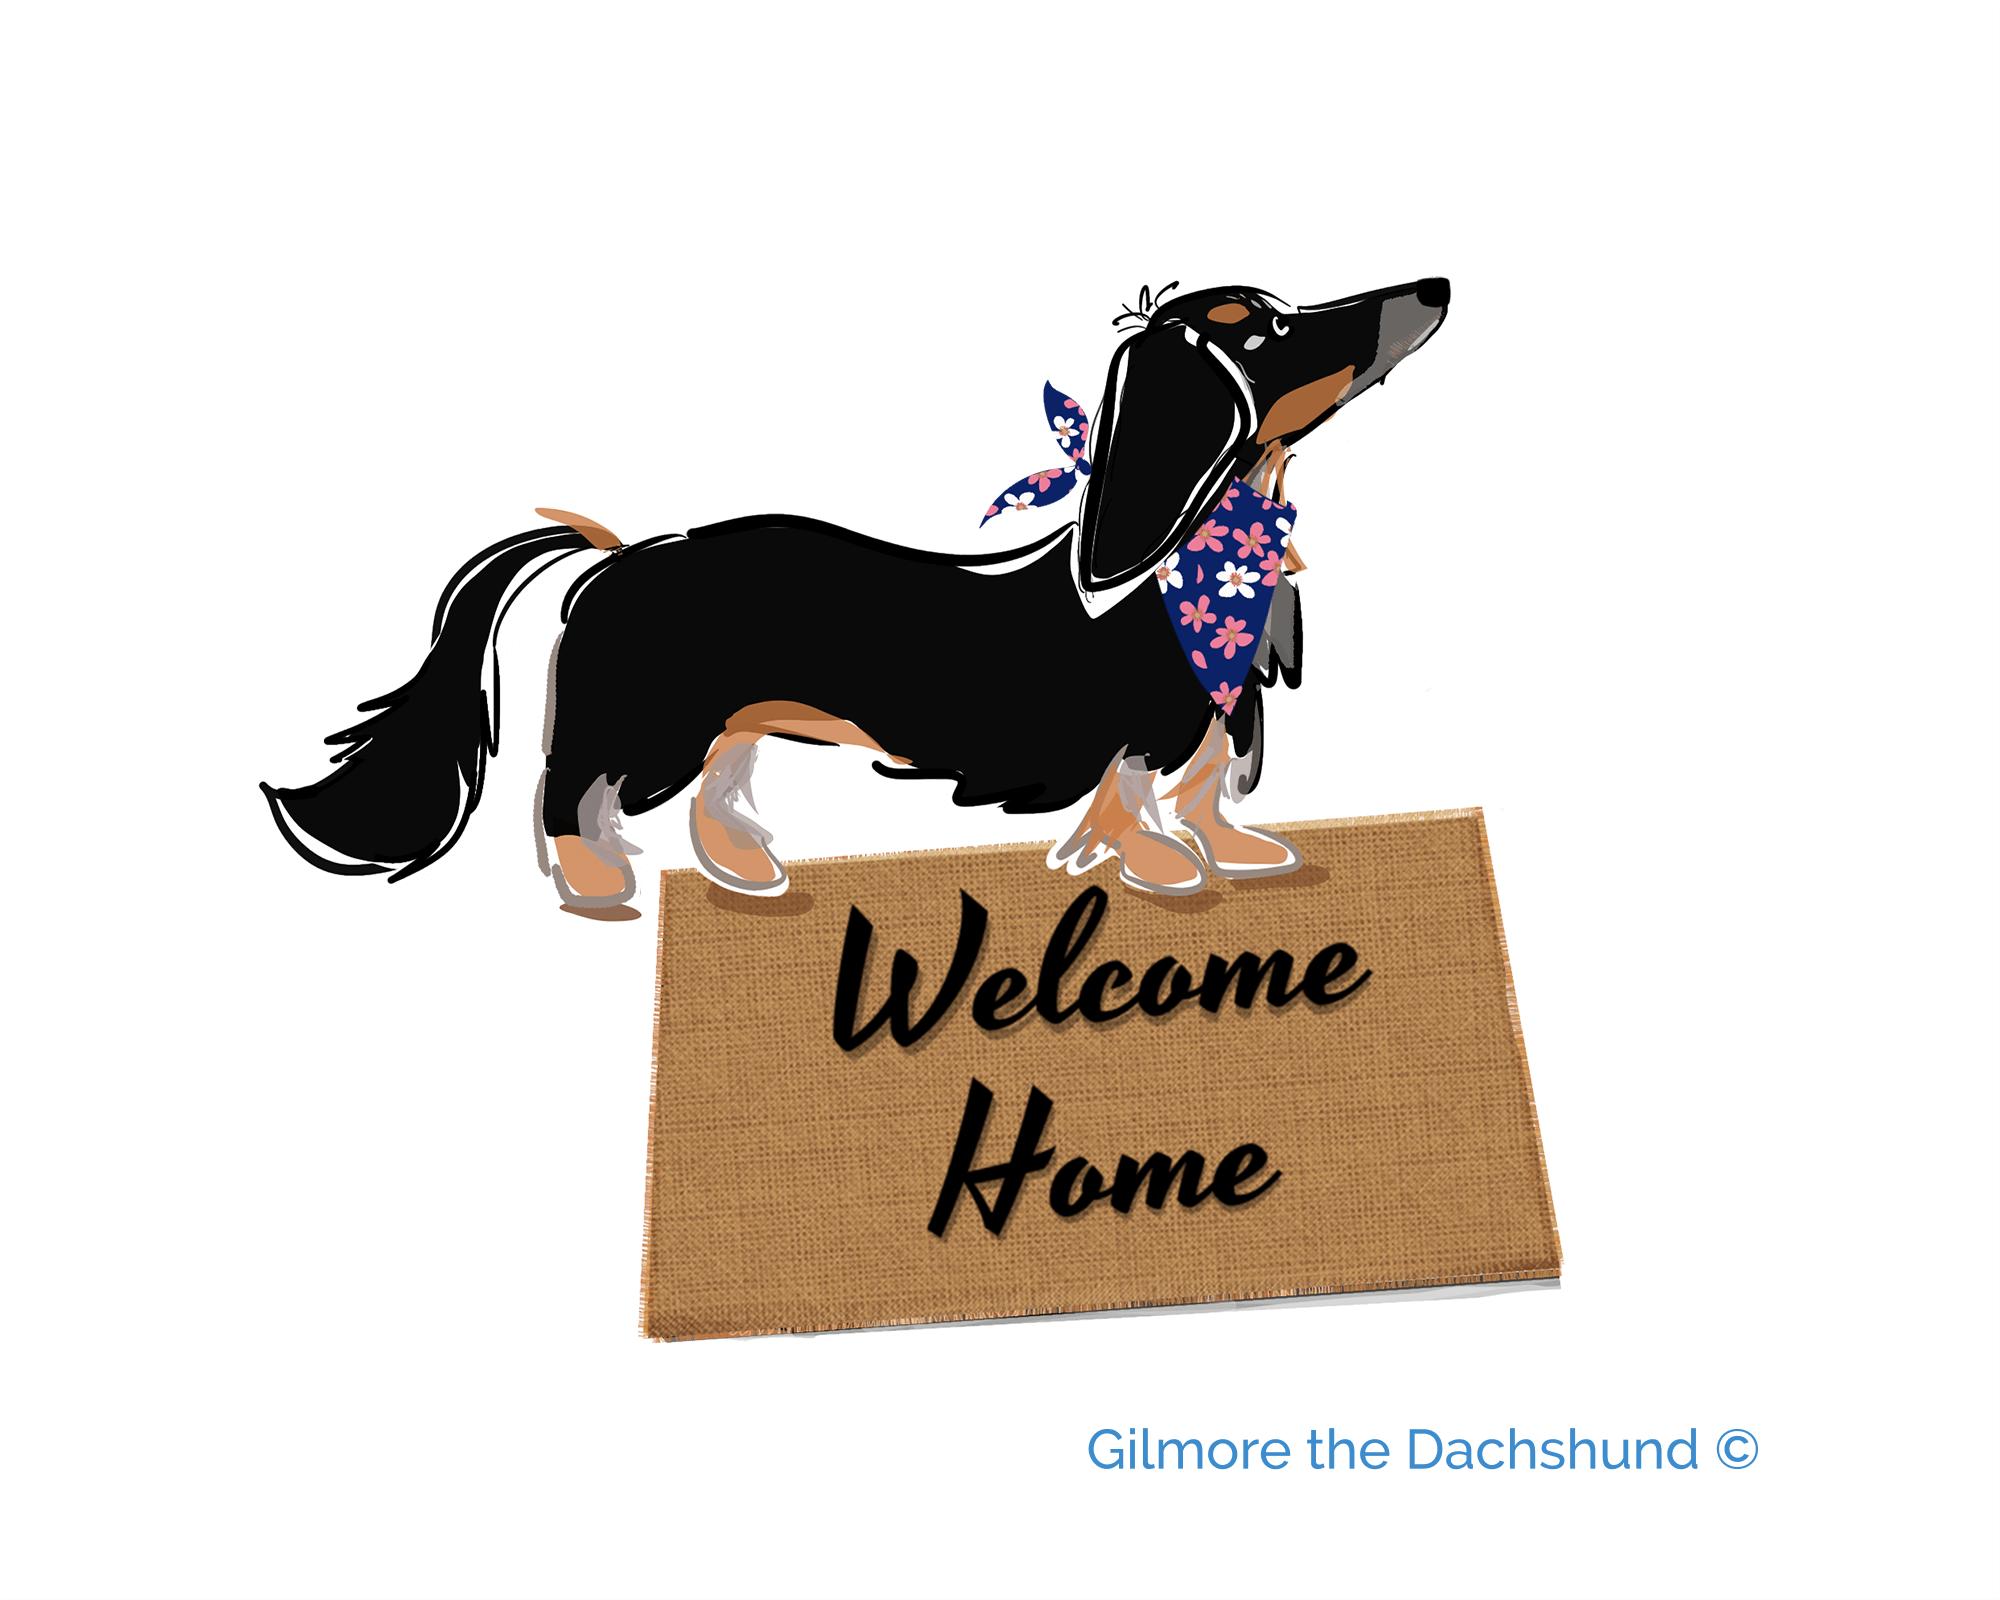 Gilmore the Dachshund custom portrait of Trixie